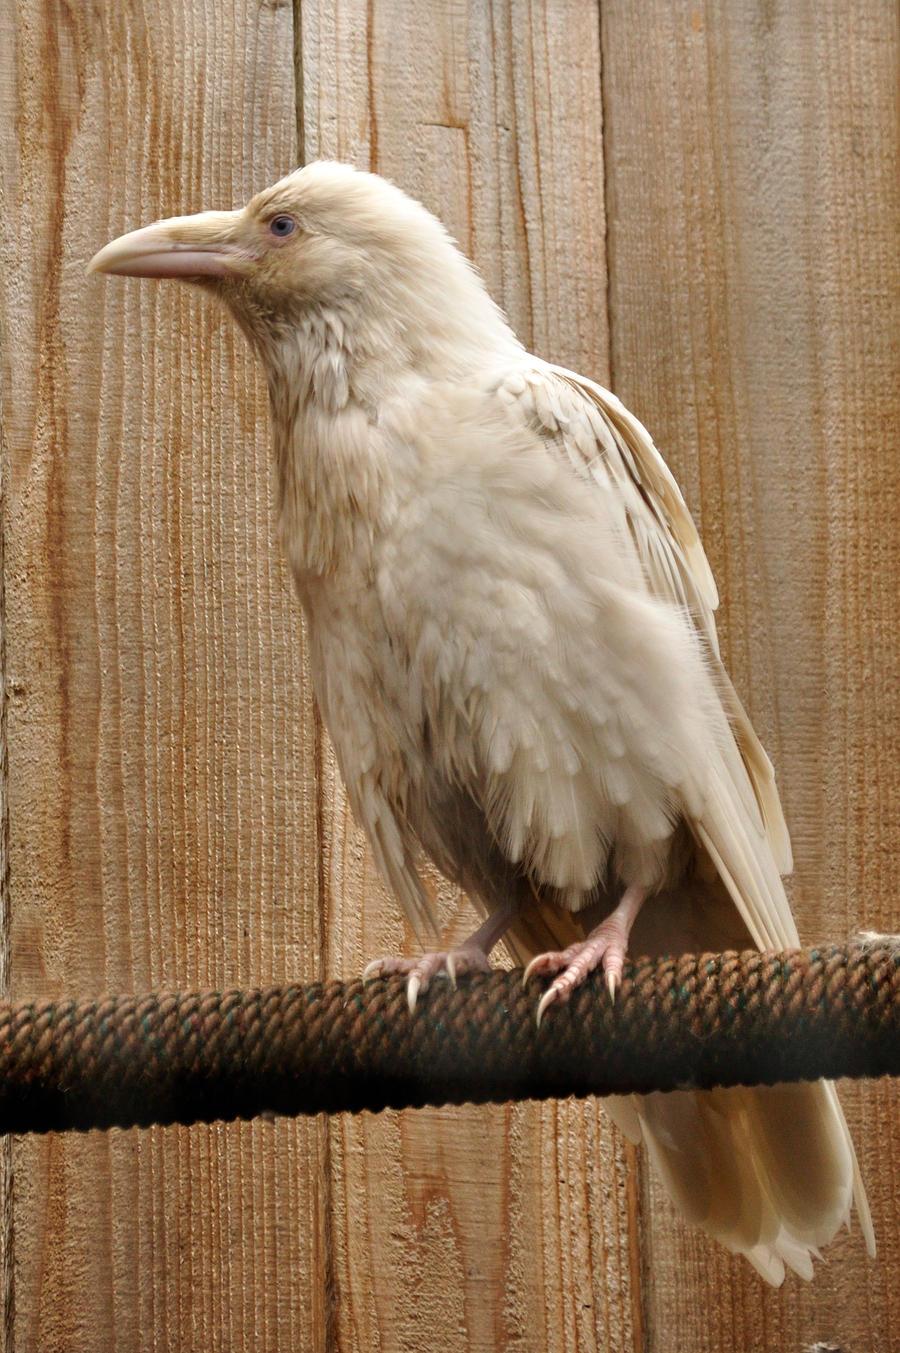 Rare white raven 2 by xxsimplicity-stock